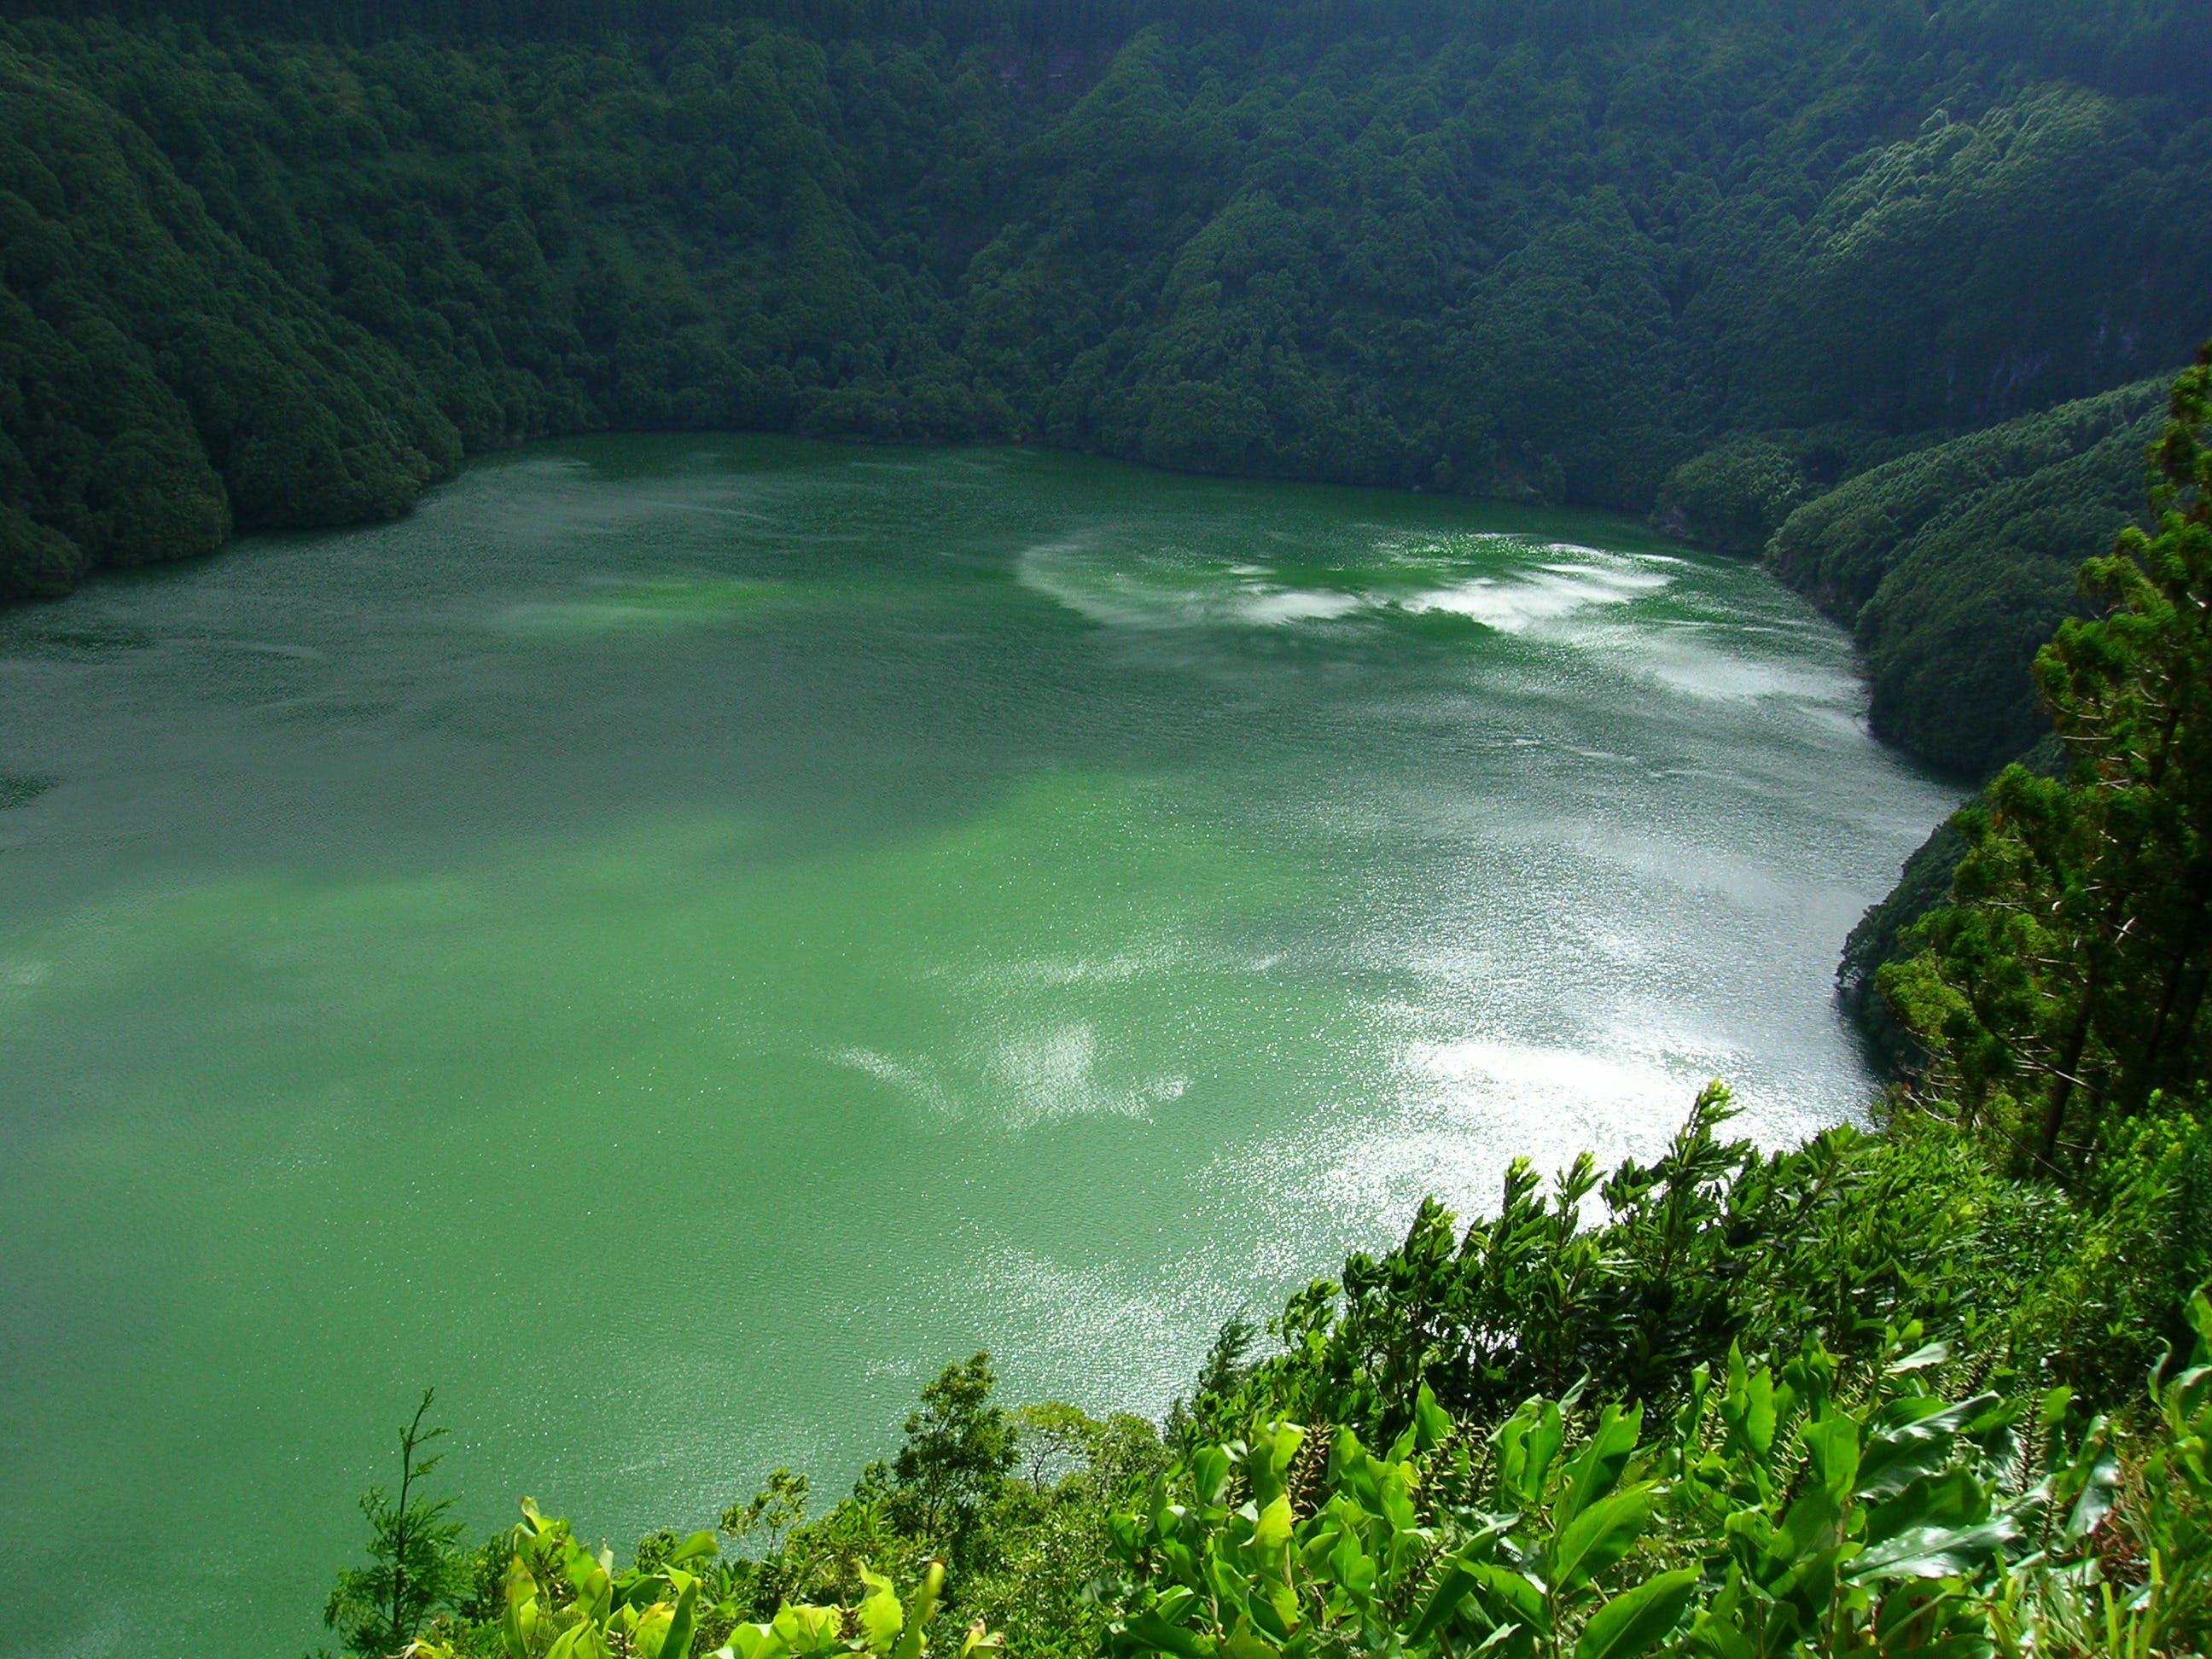 lake, nature, water